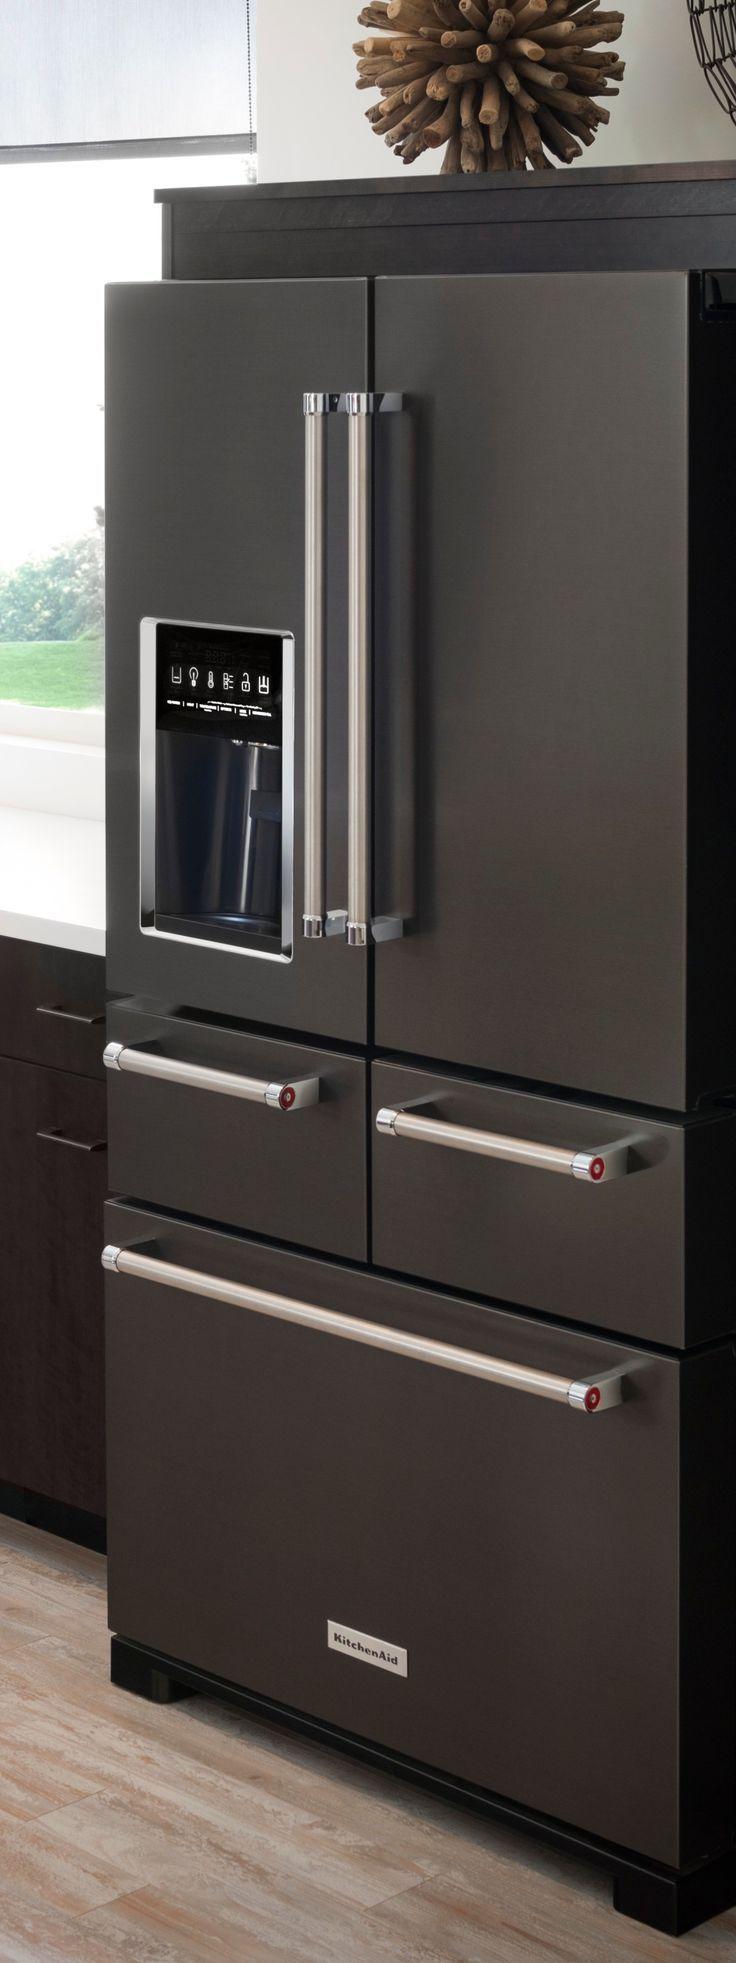 Black Stainless Steel Appliances Give Your Kitchen A Bold, Sleek Look.  KitchenAidu0027s 5